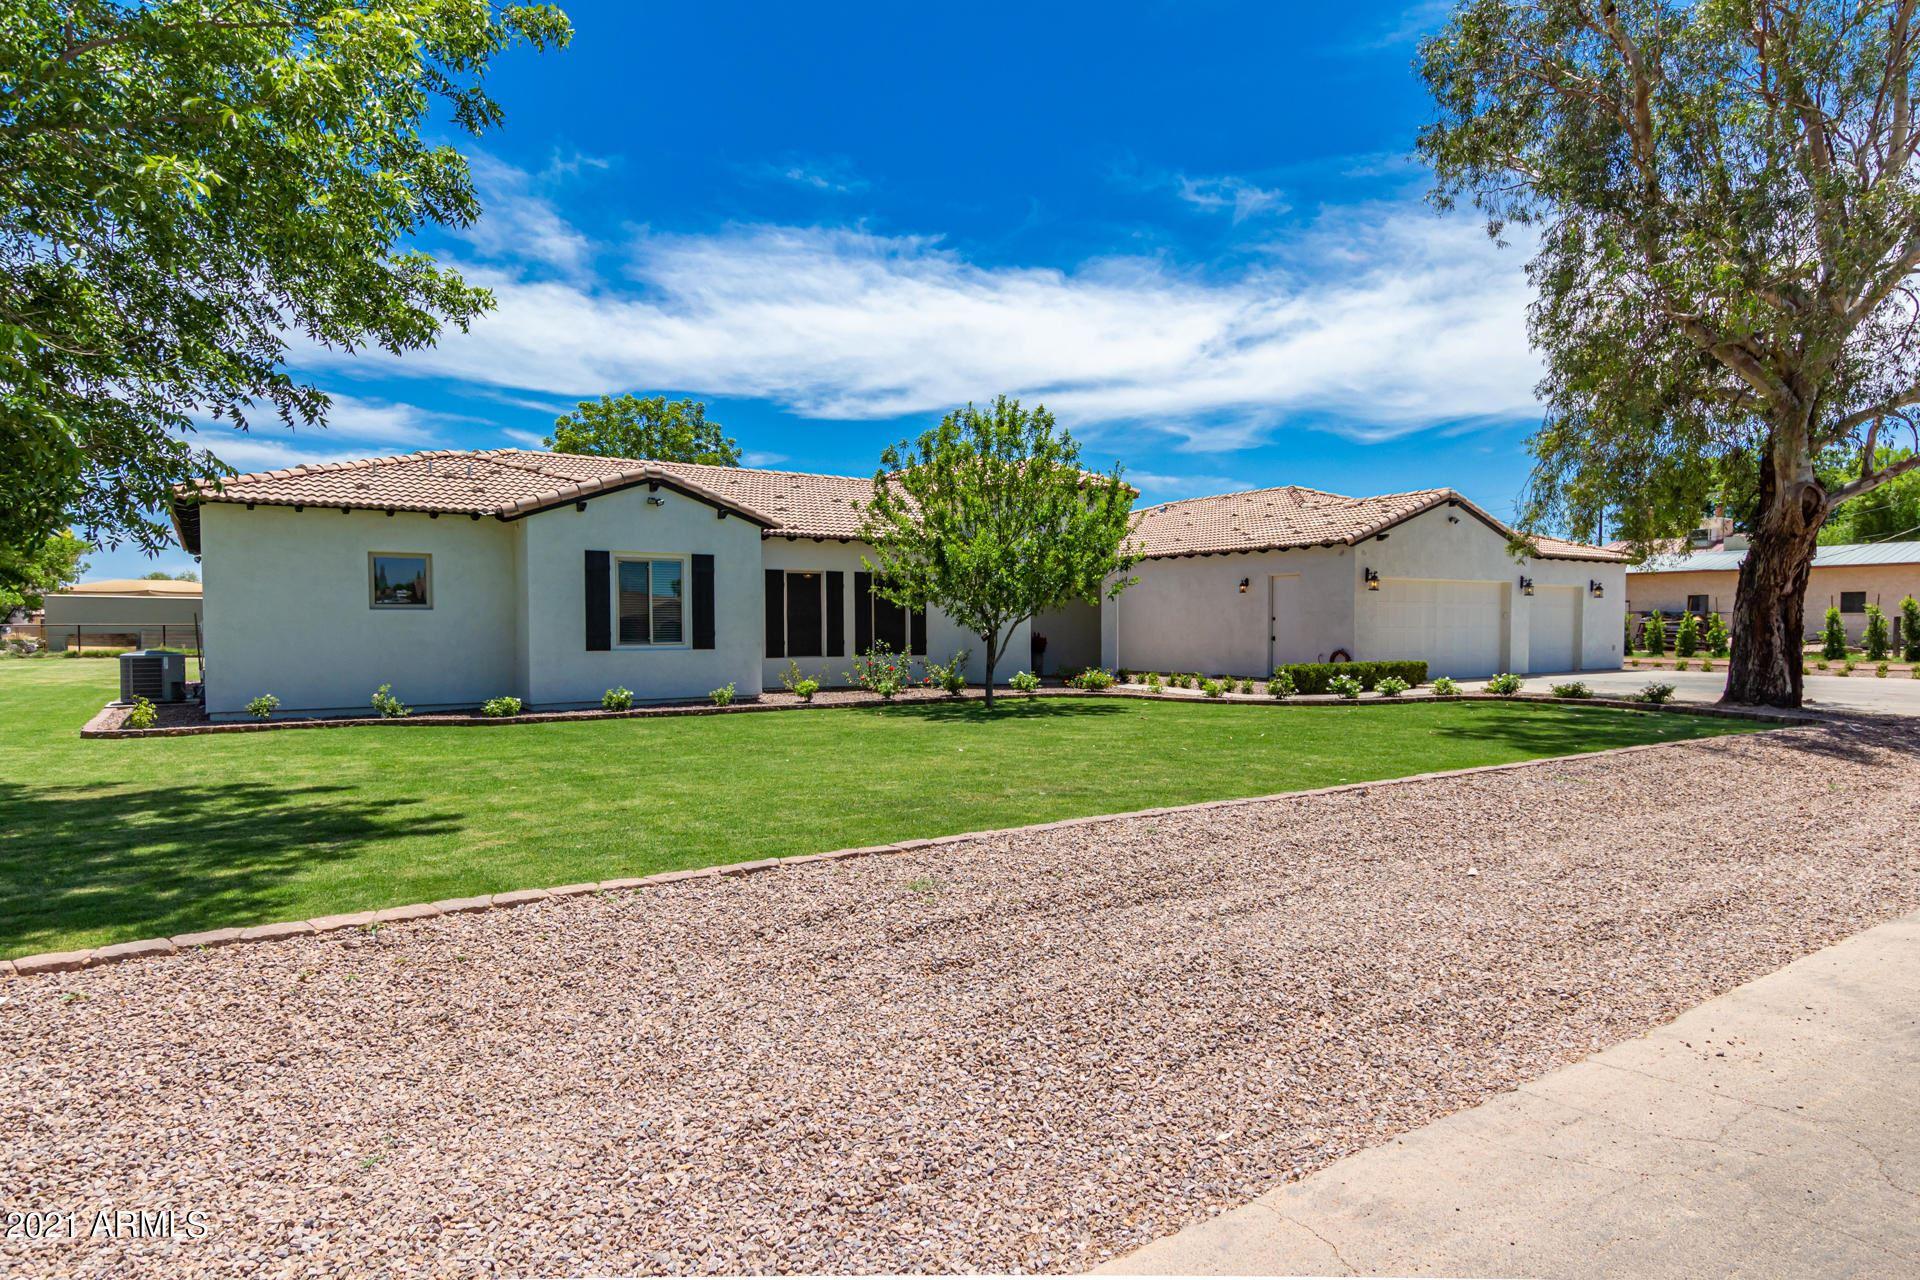 Photo of 17248 E PECOS Road, Gilbert, AZ 85295 (MLS # 6249743)